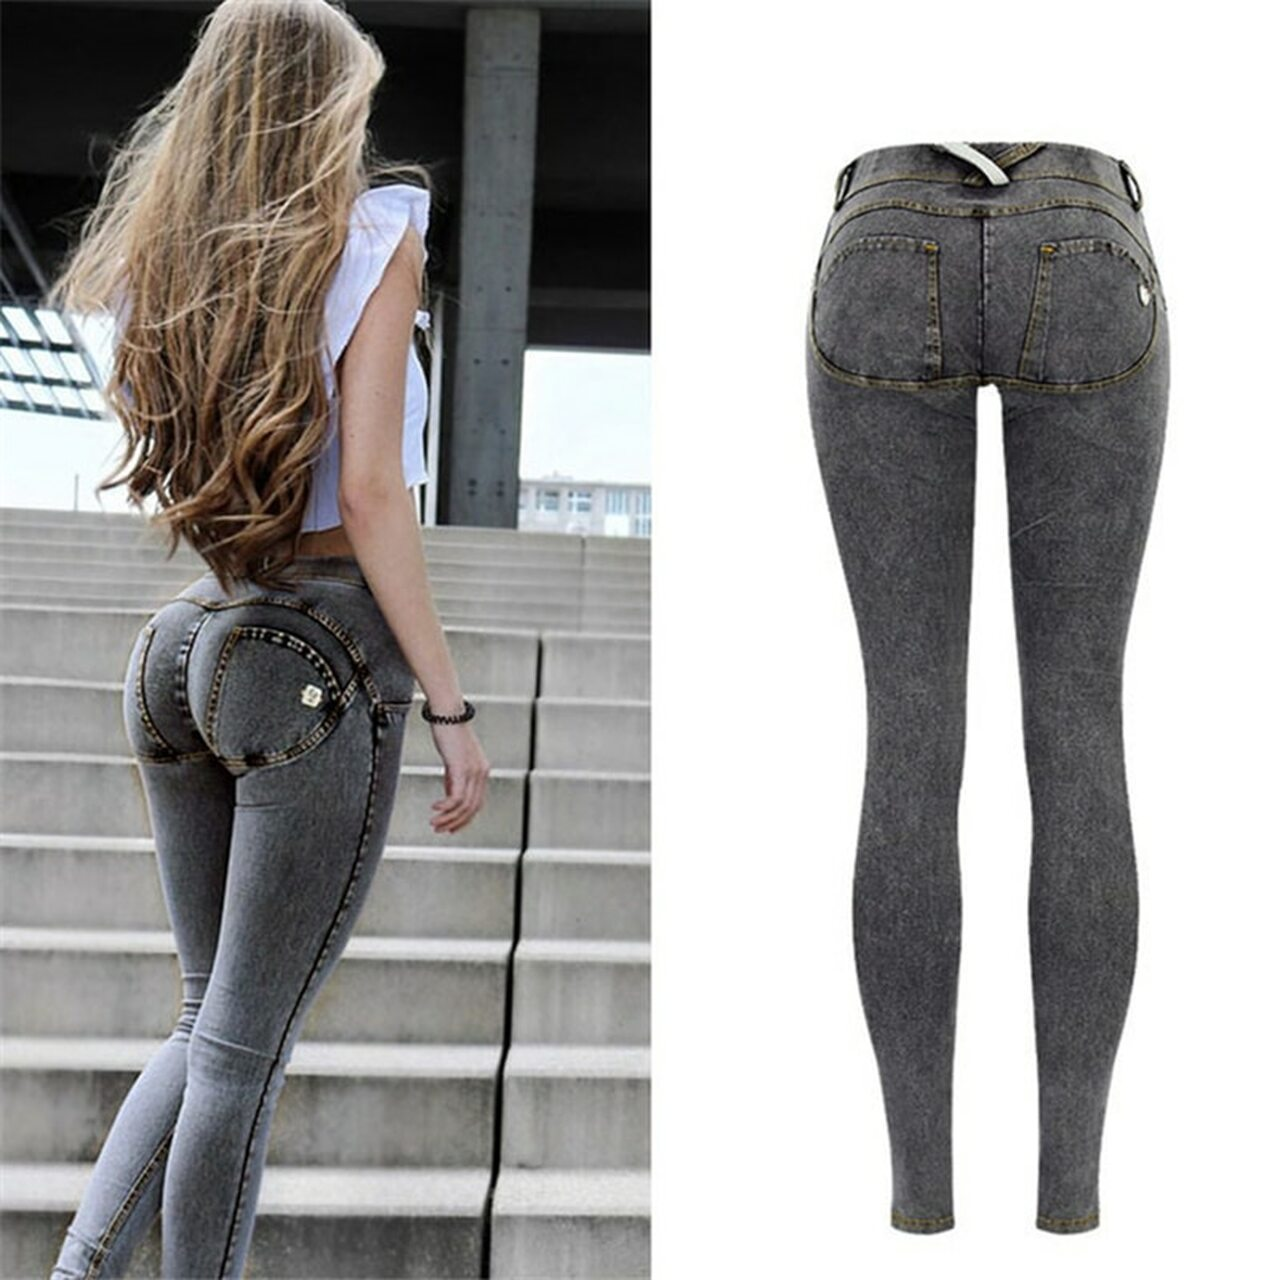 c46f39d58 Sexy Low Waist Jeans Woman Peach Push Up Hip Skinny Denim Pant For Women  Boyfriend Jean For Women Elastic grey Jeans Plus Size - OnshopDeals.Com